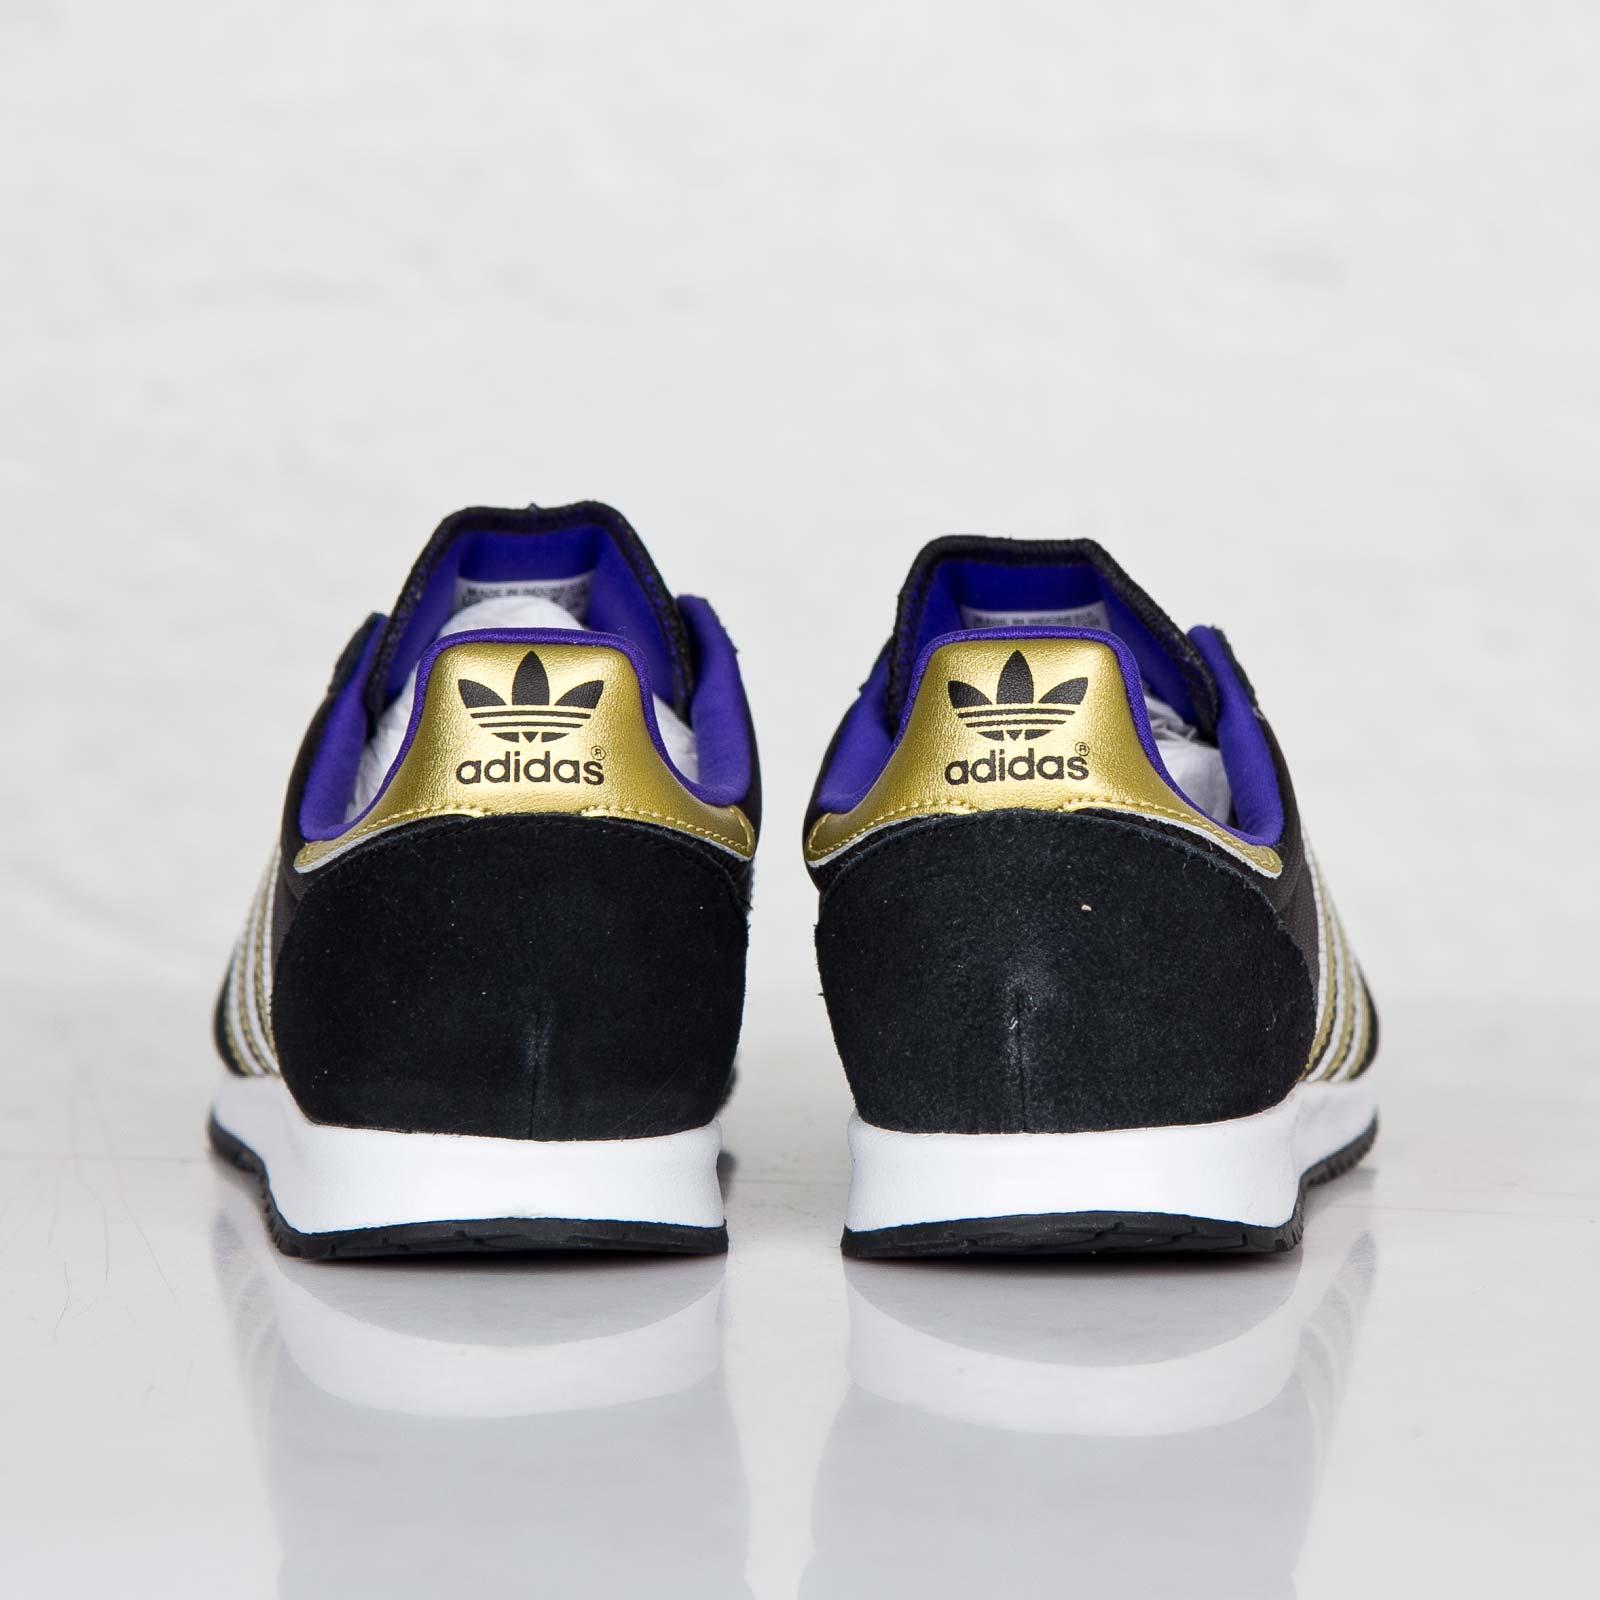 adidas Adistar Racer W M19214 Sneakersnstuff | sneakers